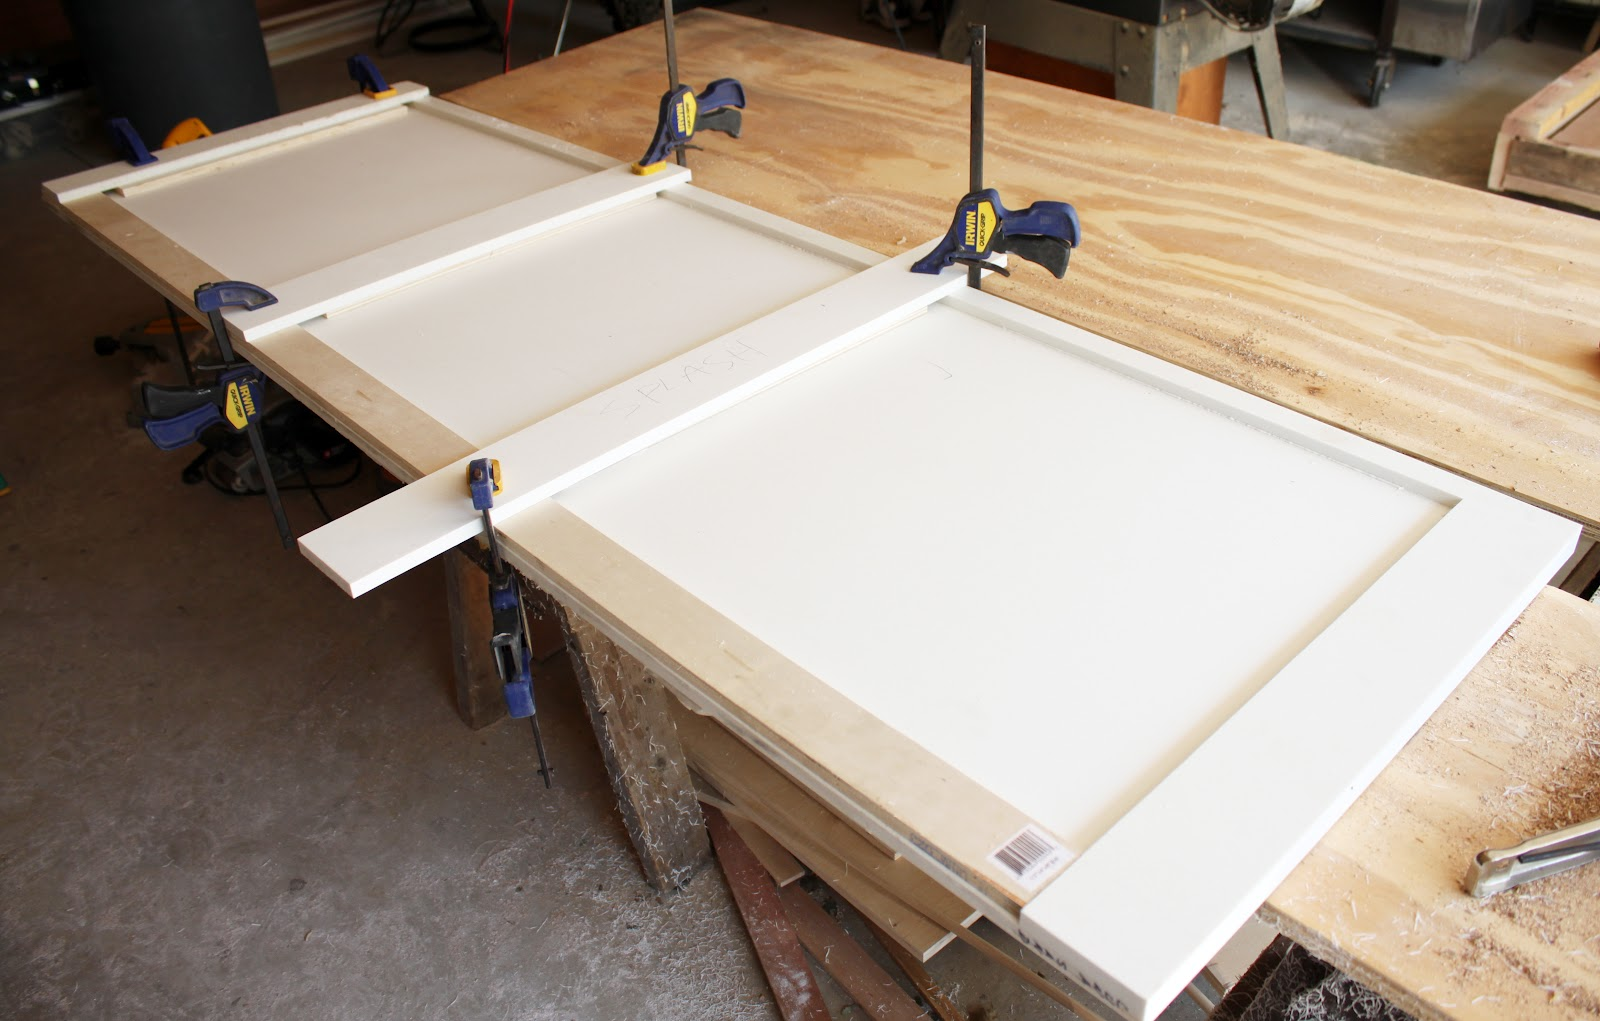 Bathroom redo part six diy solid surface countertops danks and honey